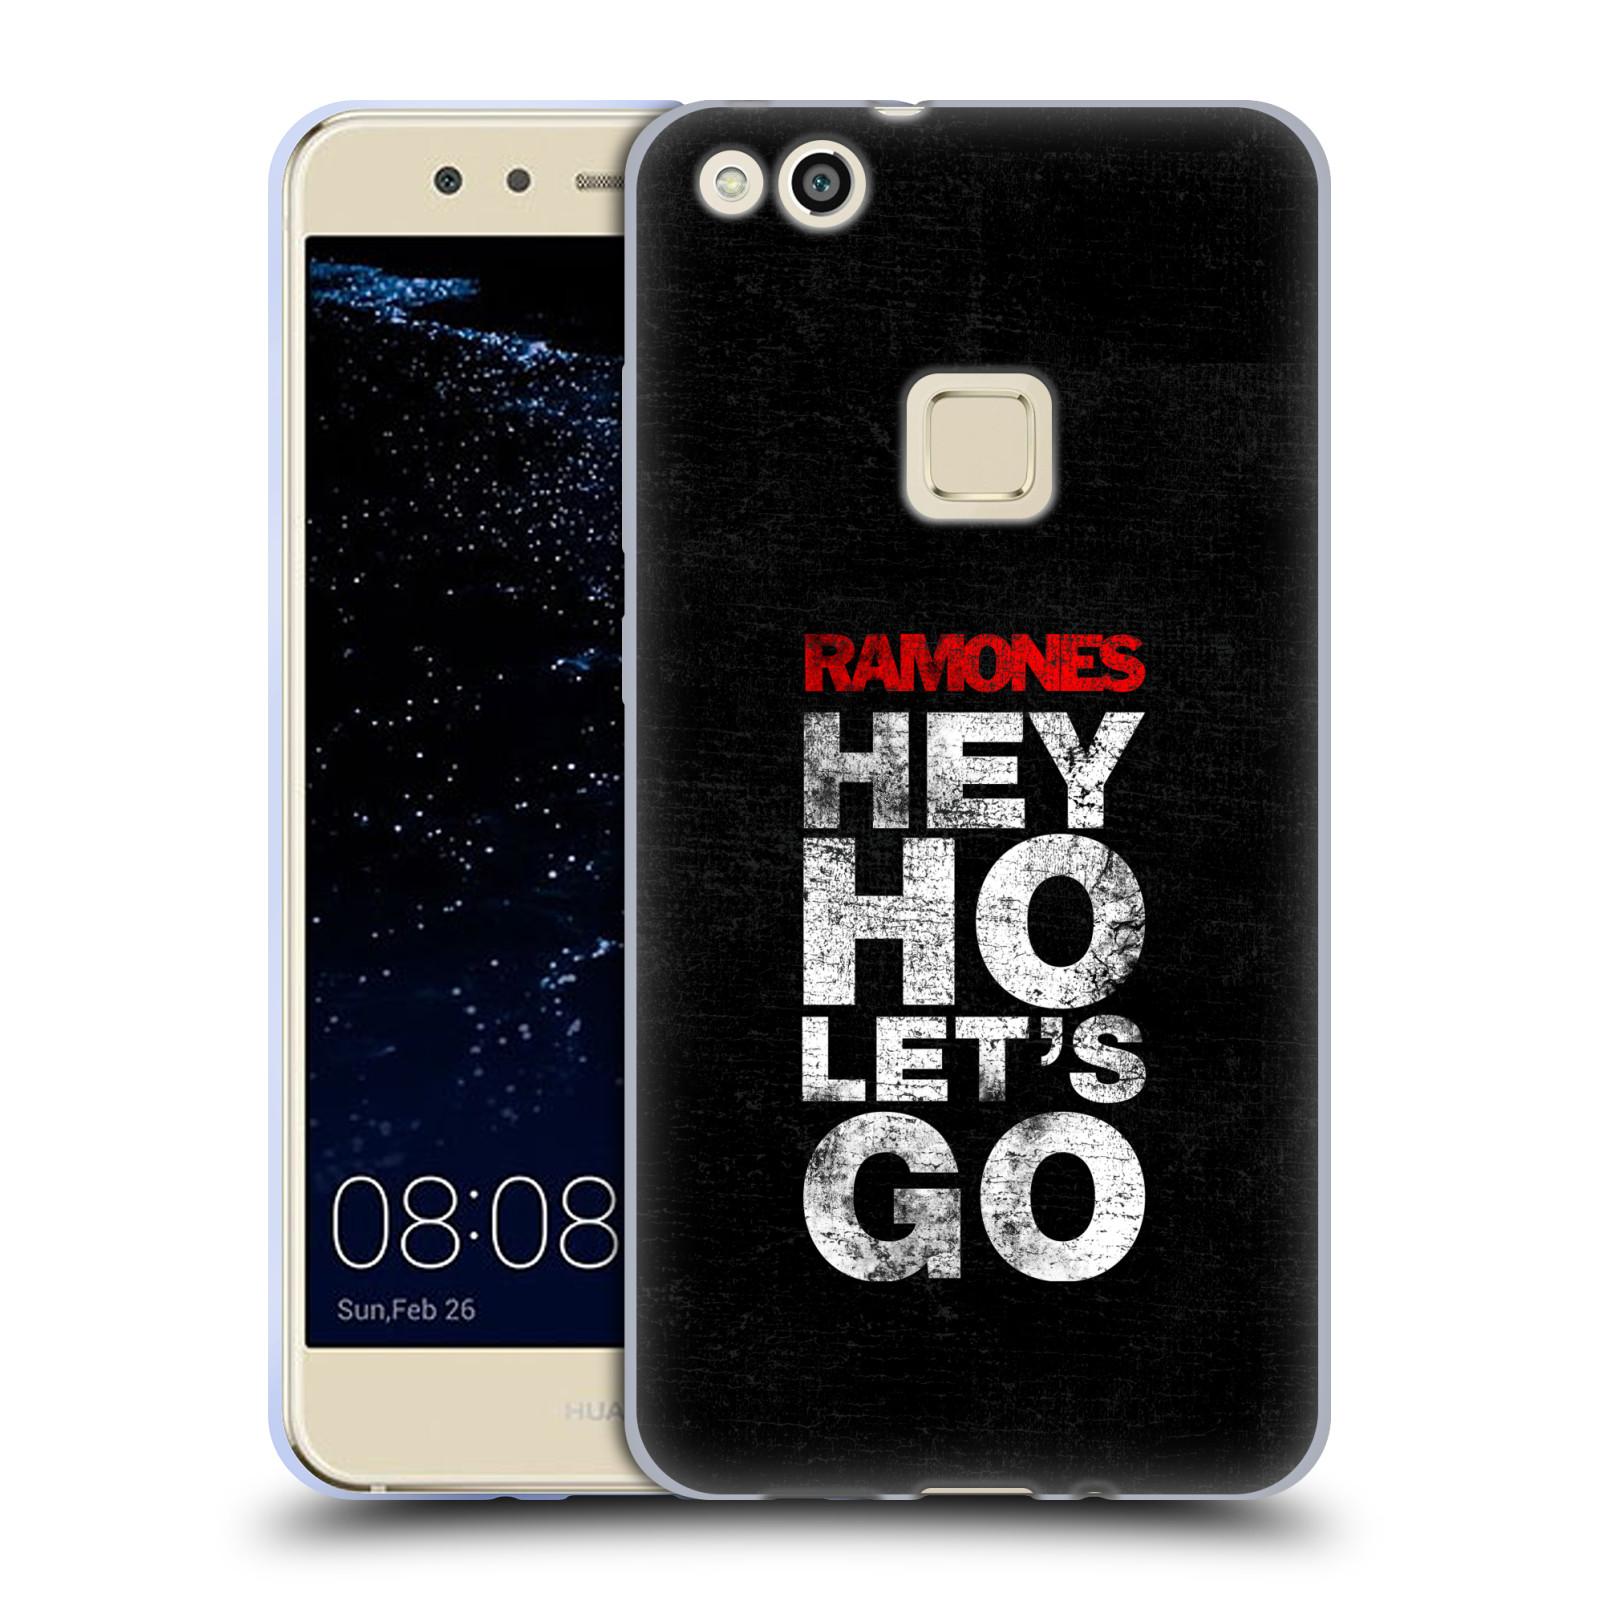 Silikonové pouzdro na mobil Huawei P10 Lite Head Case - The Ramones - HEY HO LET´S GO (Silikonový kryt či obal na mobilní telefon s oficiálním licencovaným motivem The Ramones pro Huawei P10 Lite Dual SIM (LX1/LX1A))